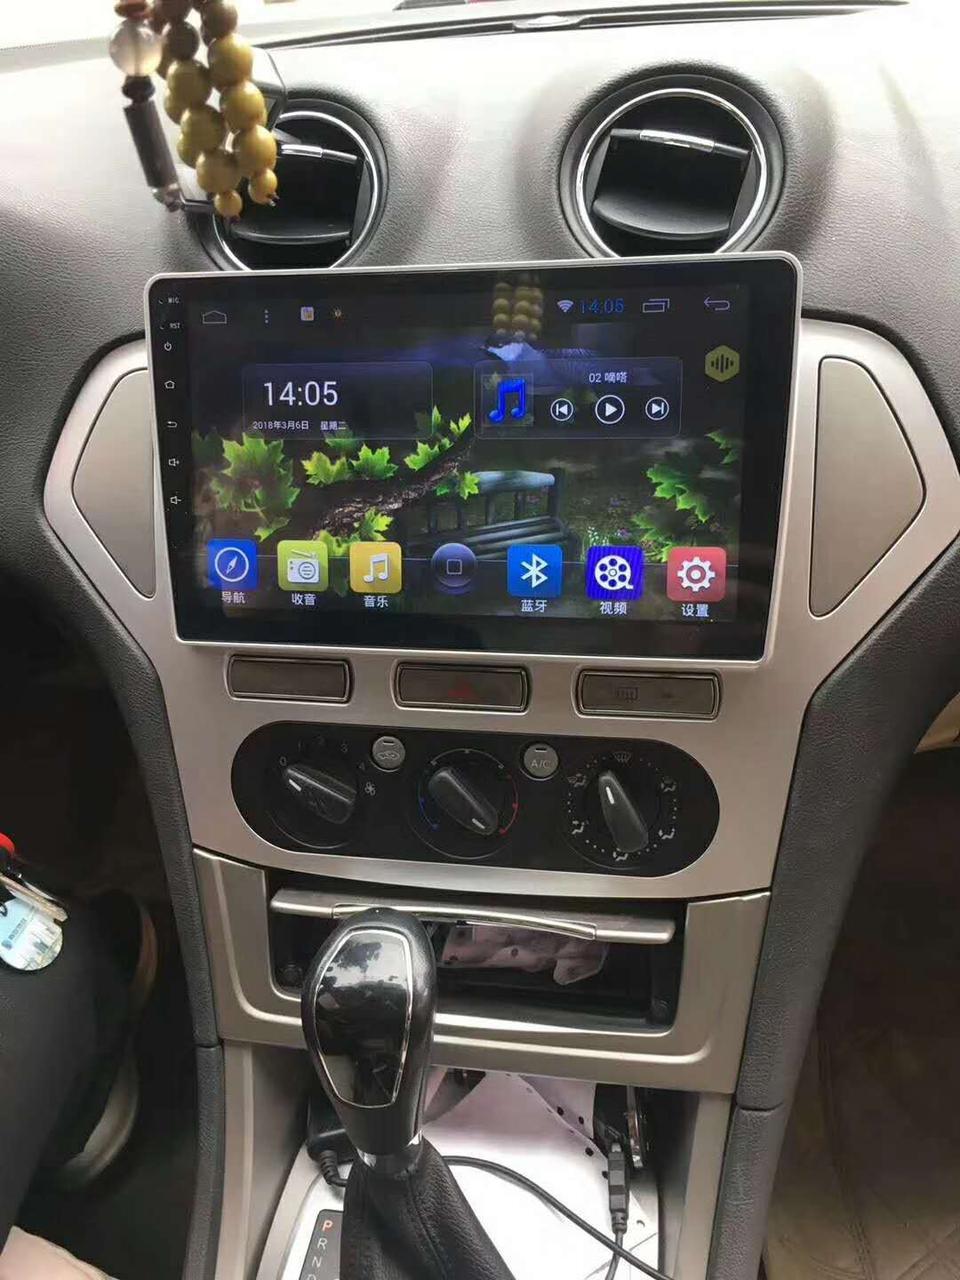 Штатна Android Магнітола на Ford Mondeo 4 2010-2014 Model 4G-solution (М-ФМ4-10-4Ж)